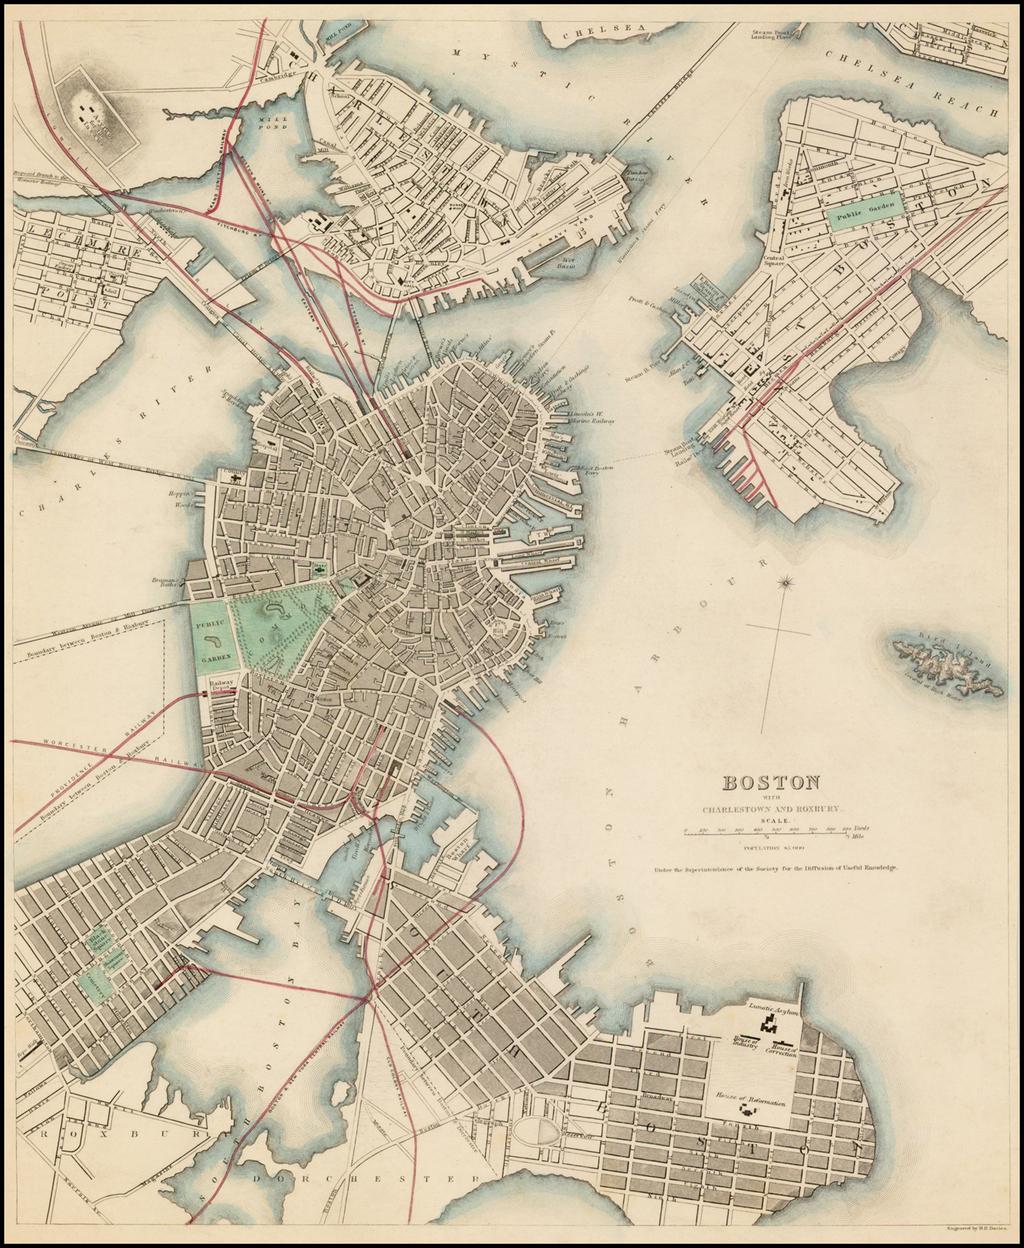 Boston with Charlestown and Roxbury. By SDUK